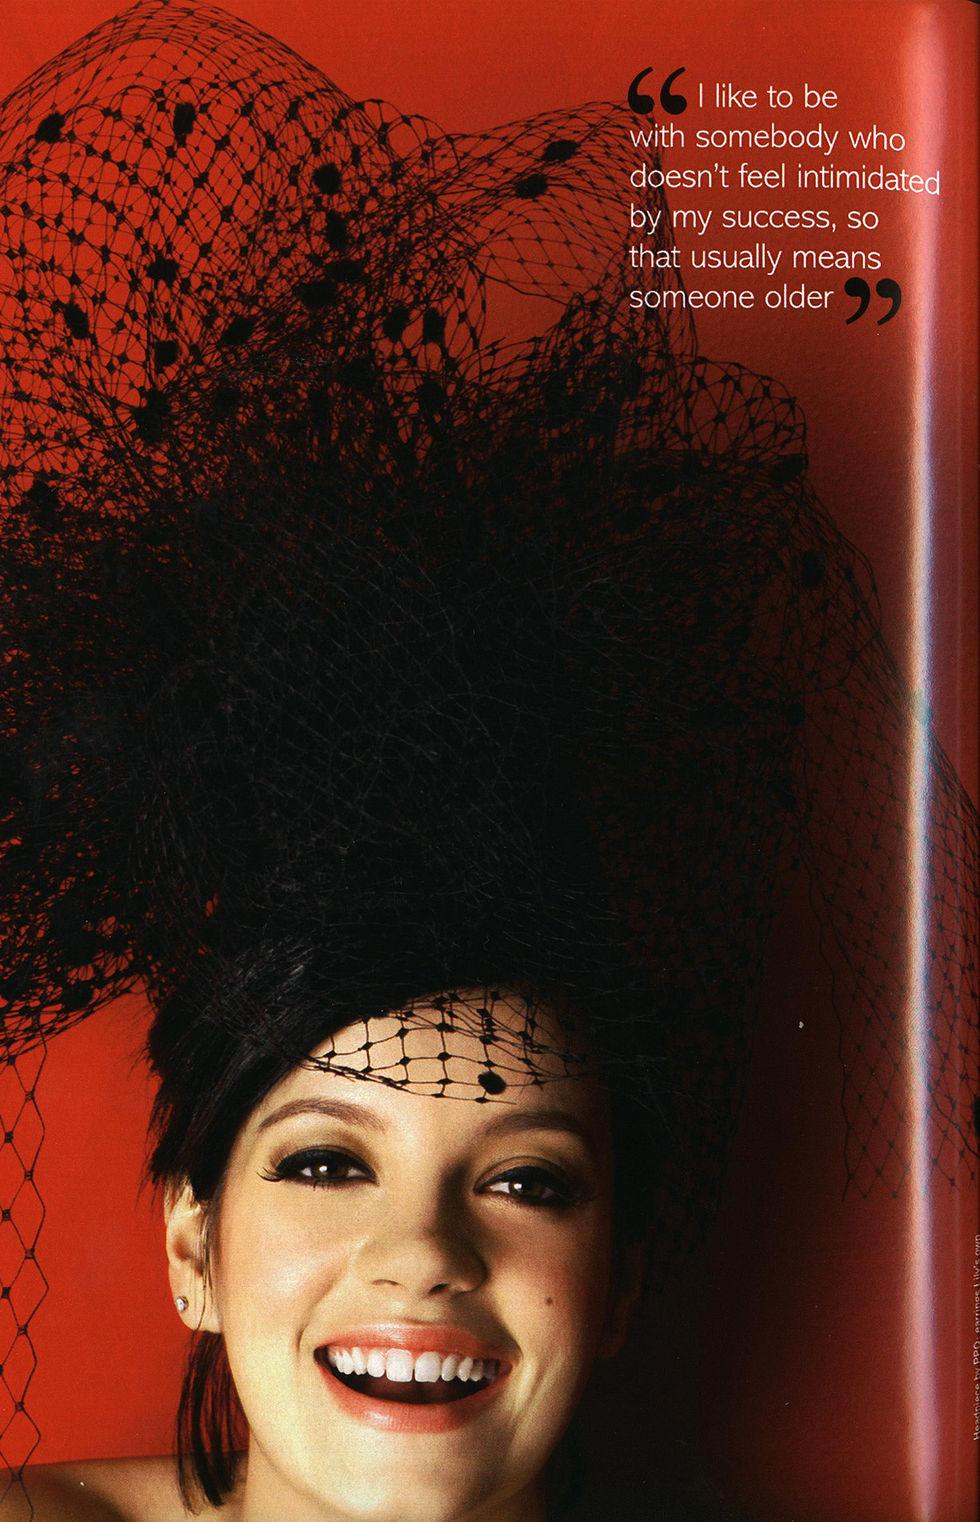 lily-allen-glamour-magazine-march-2009-01